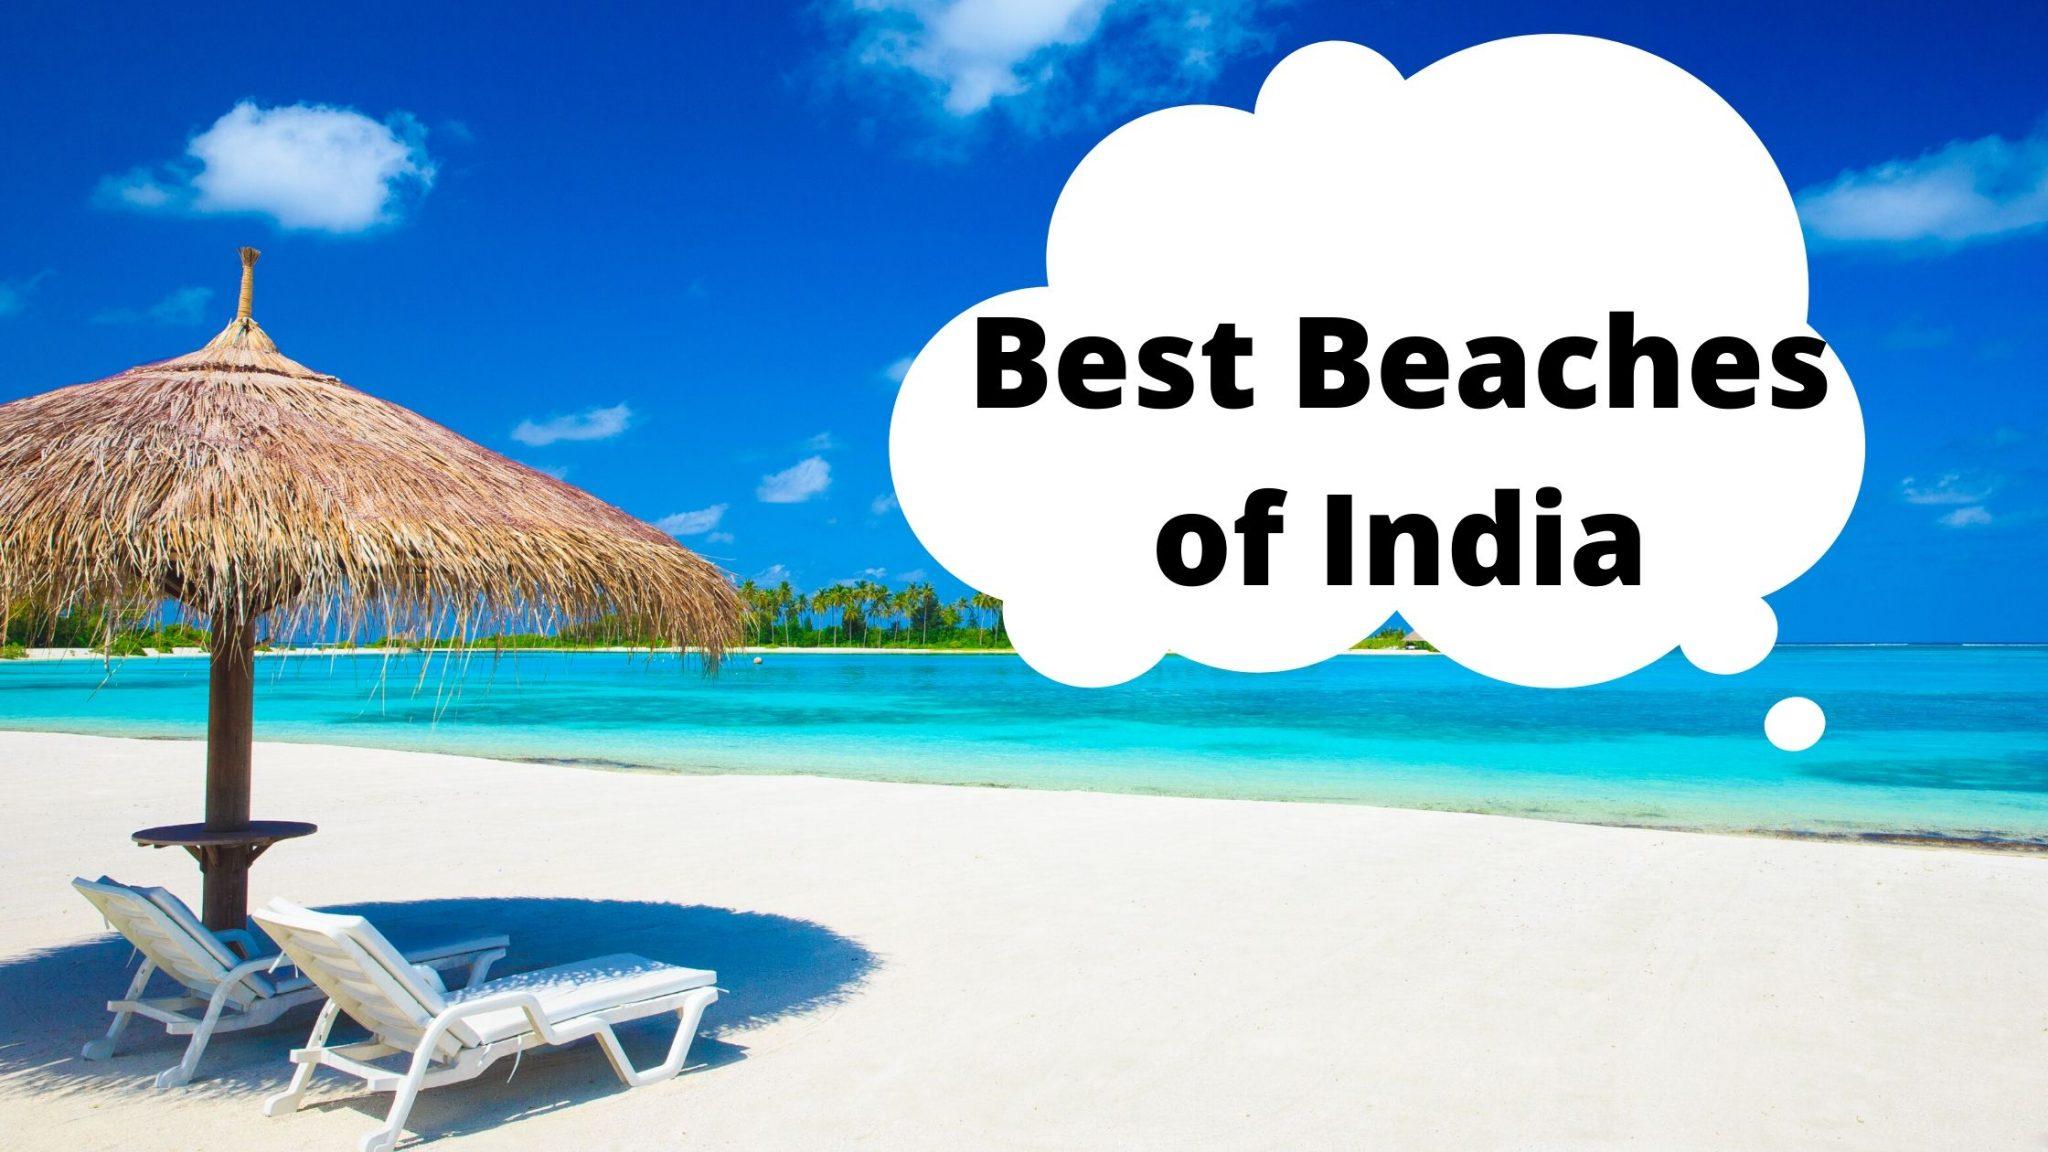 Best Beaches of India